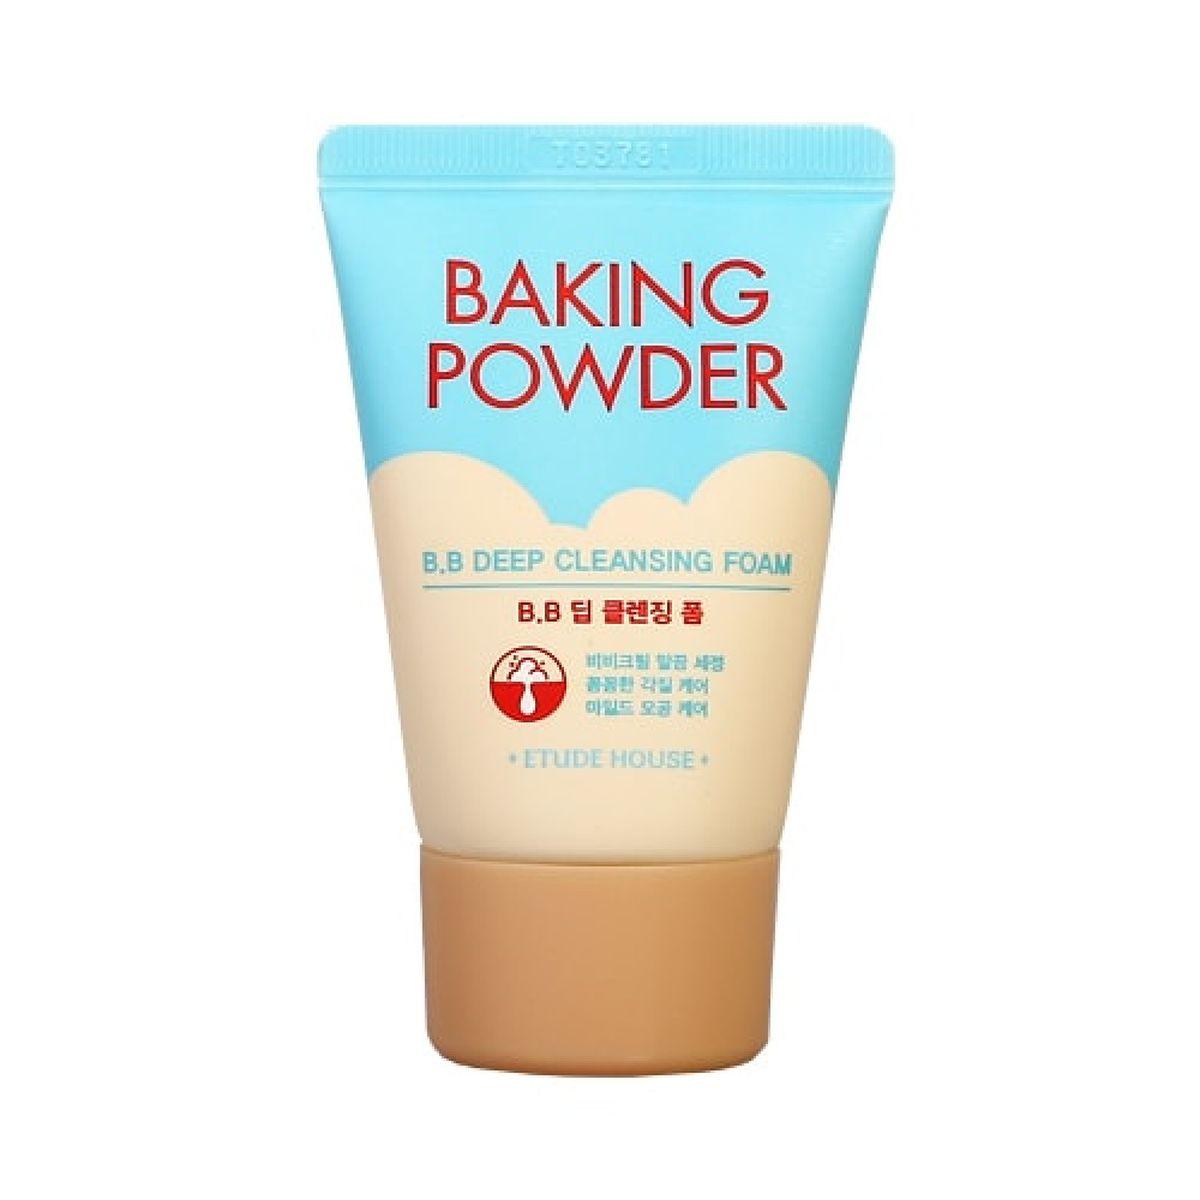 Миниатюра очищающей пенки с содой Etude House Baking Powder B.B Deep Cleansing Foam - 30 мл